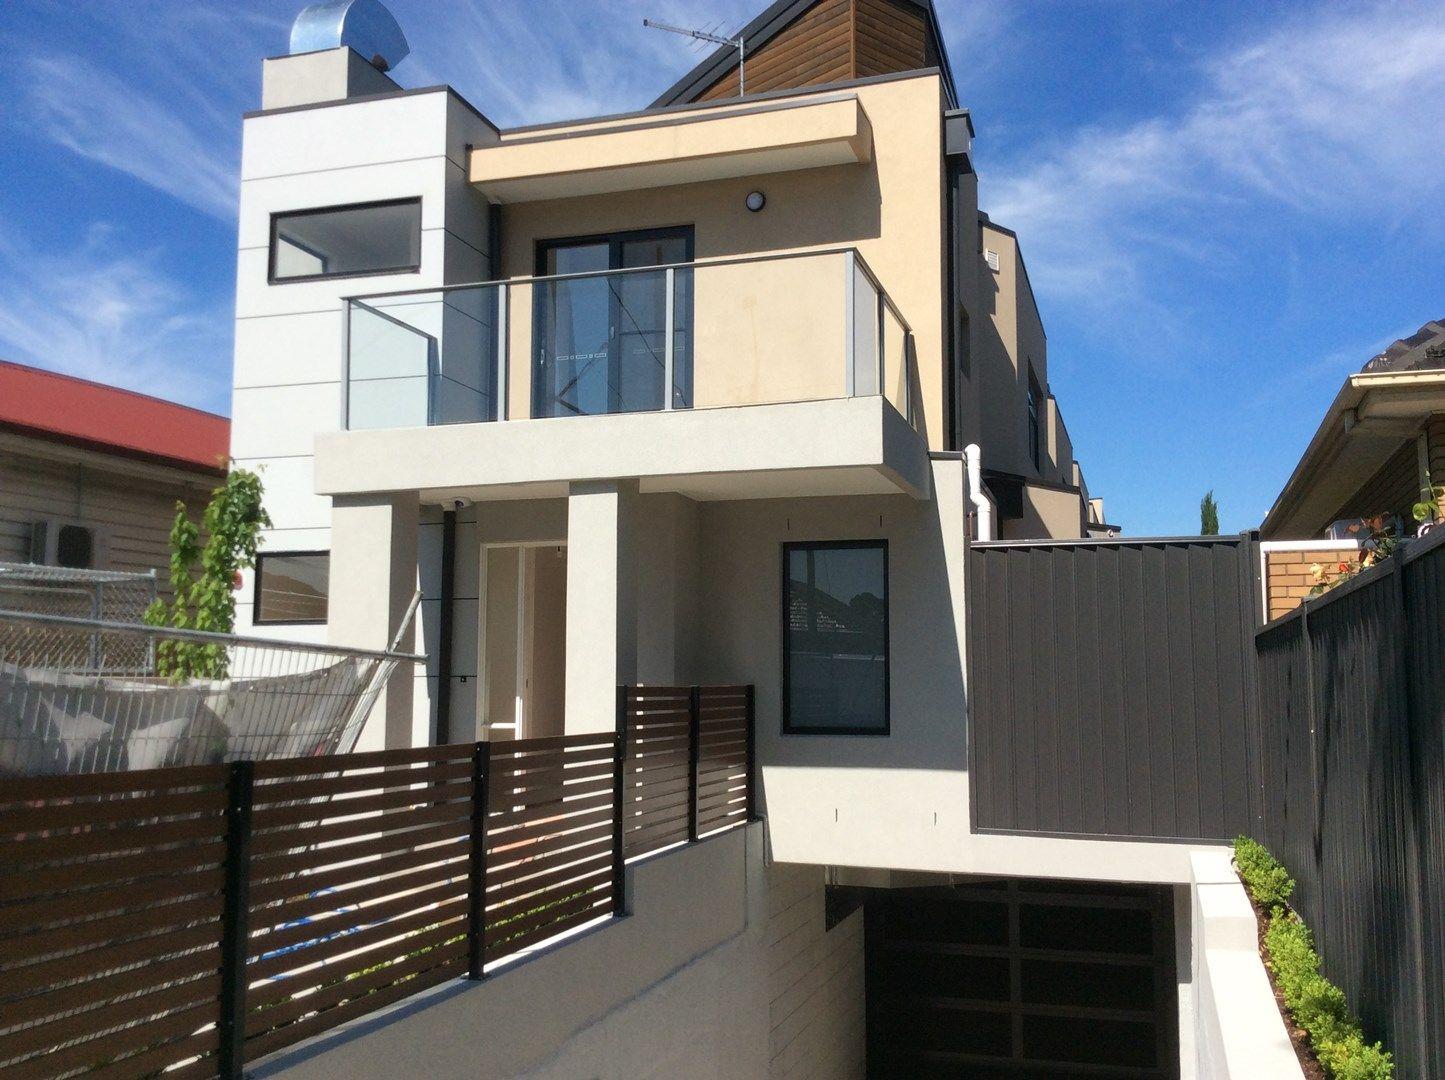 5/55 Droop Street, Footscray VIC 3011, Image 0